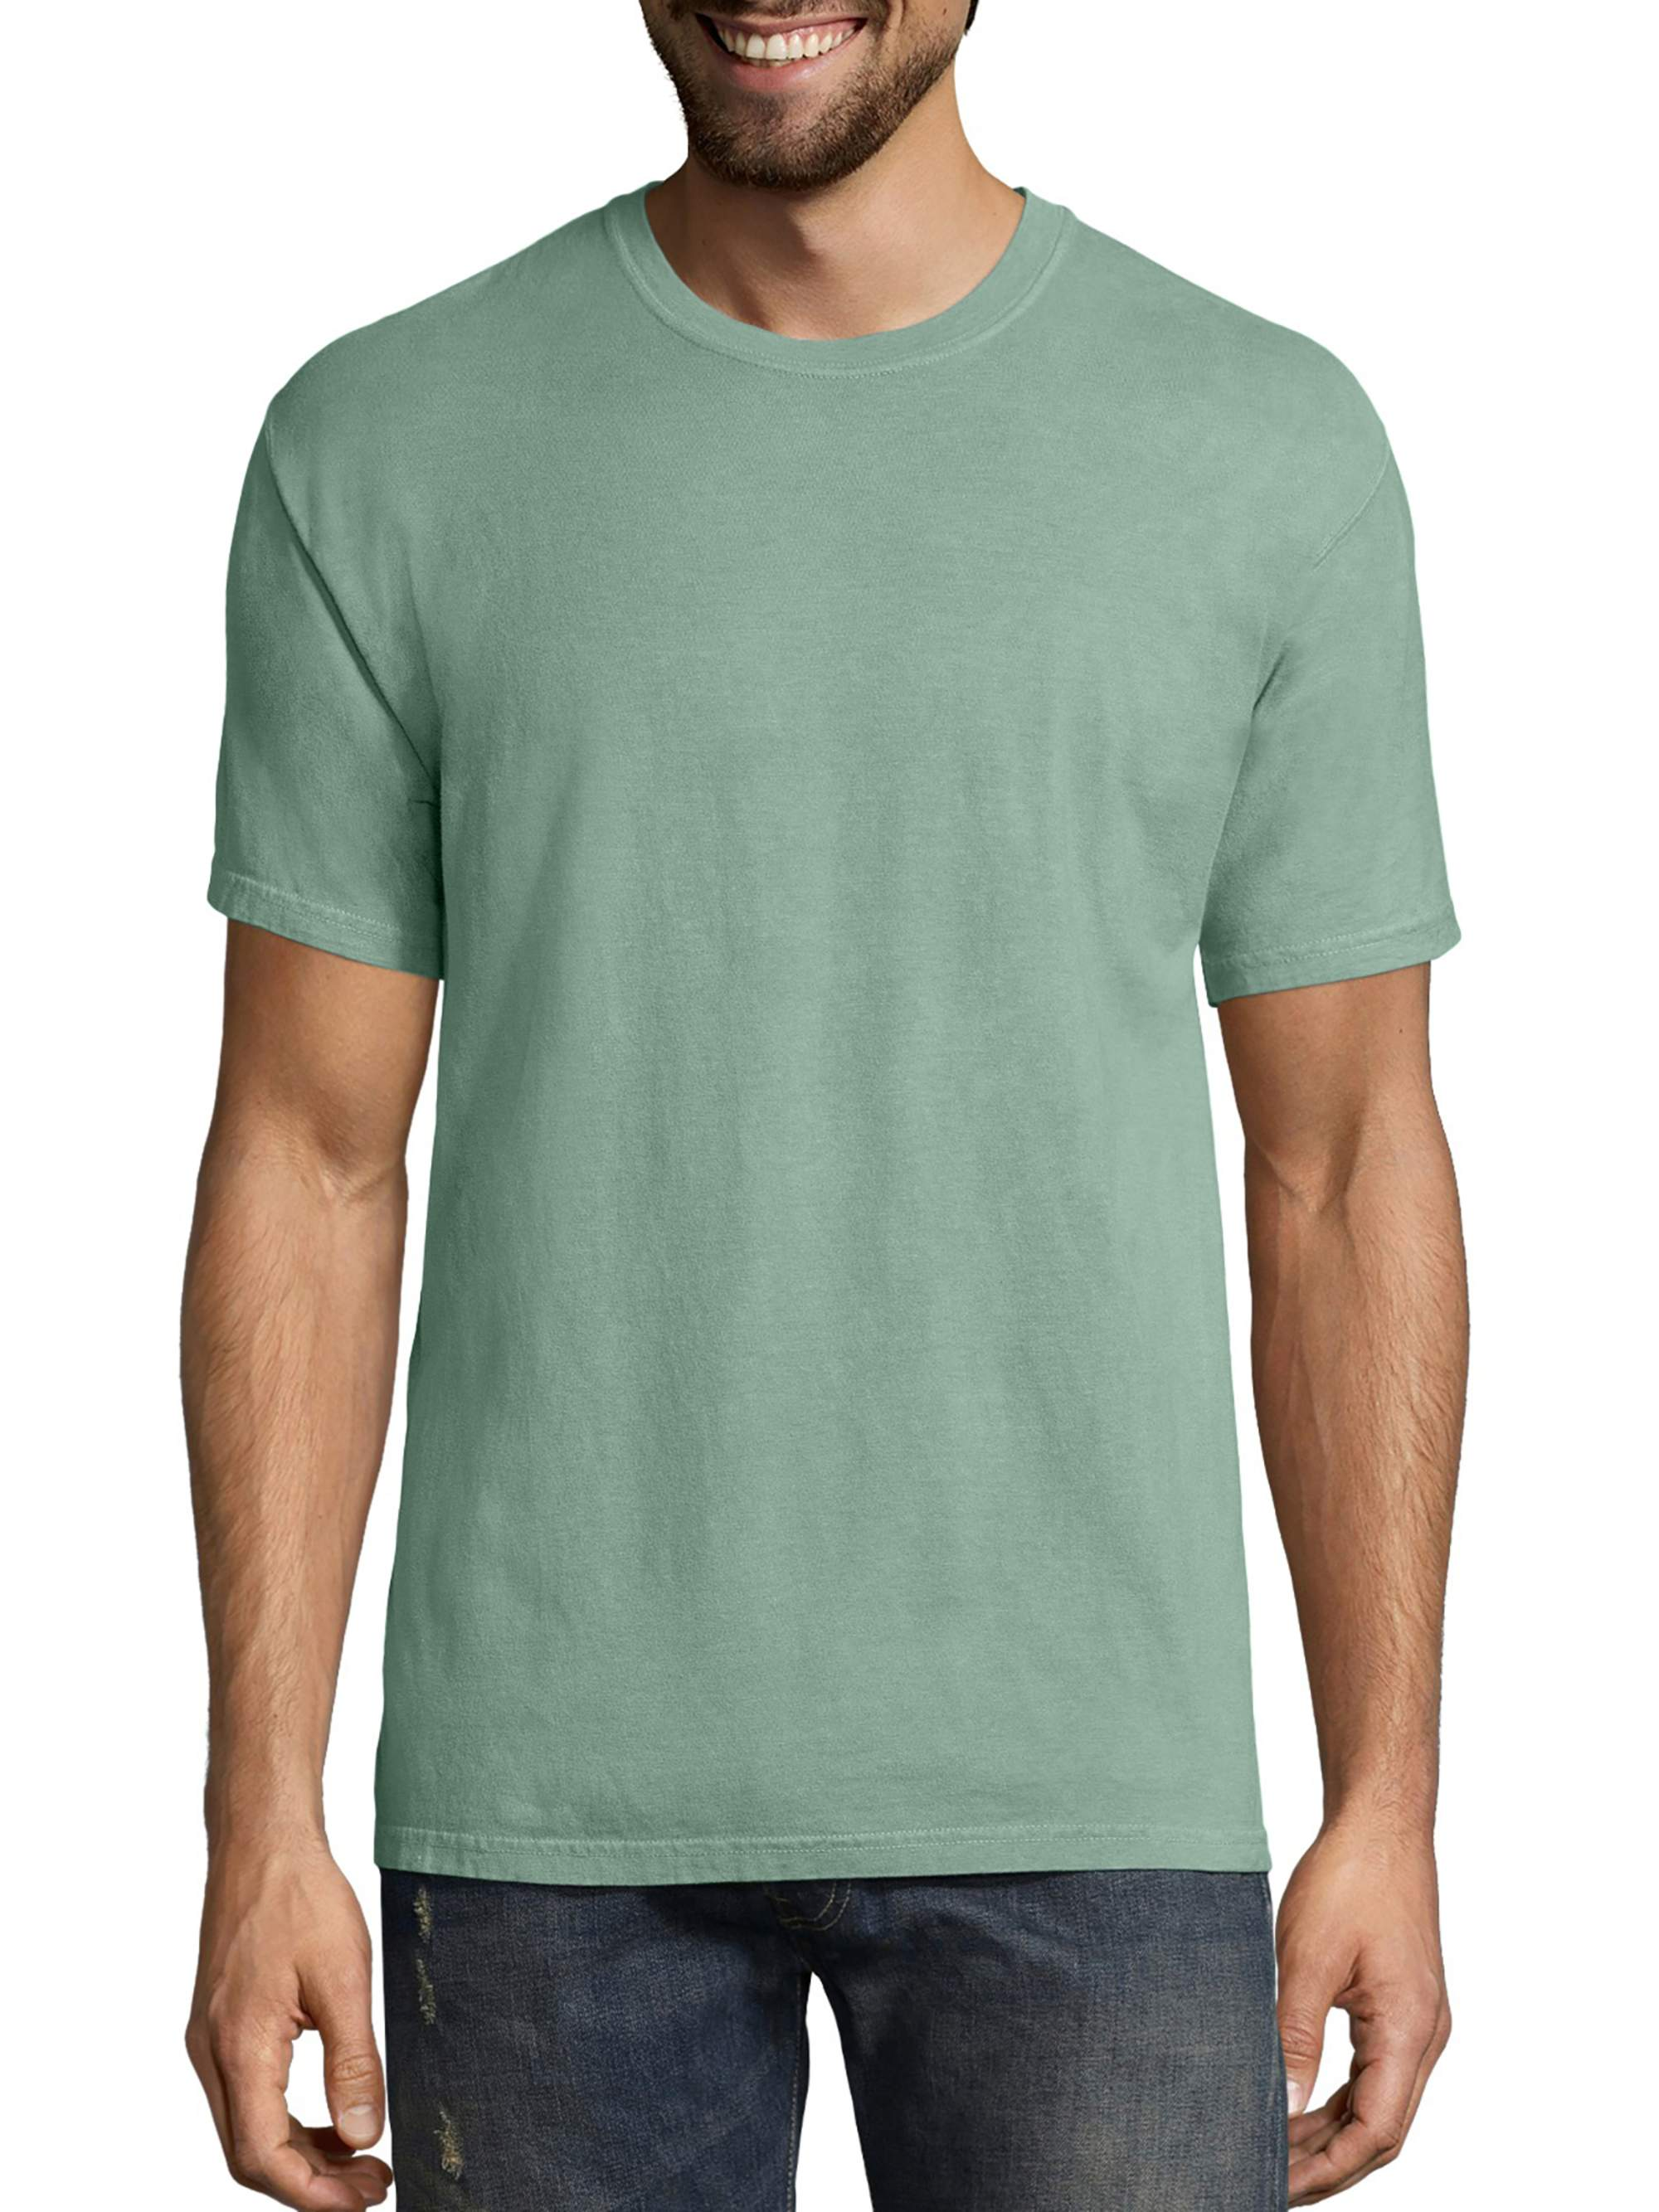 Big Men's ComfortWash Garment Dyed Short Sleeve Tee